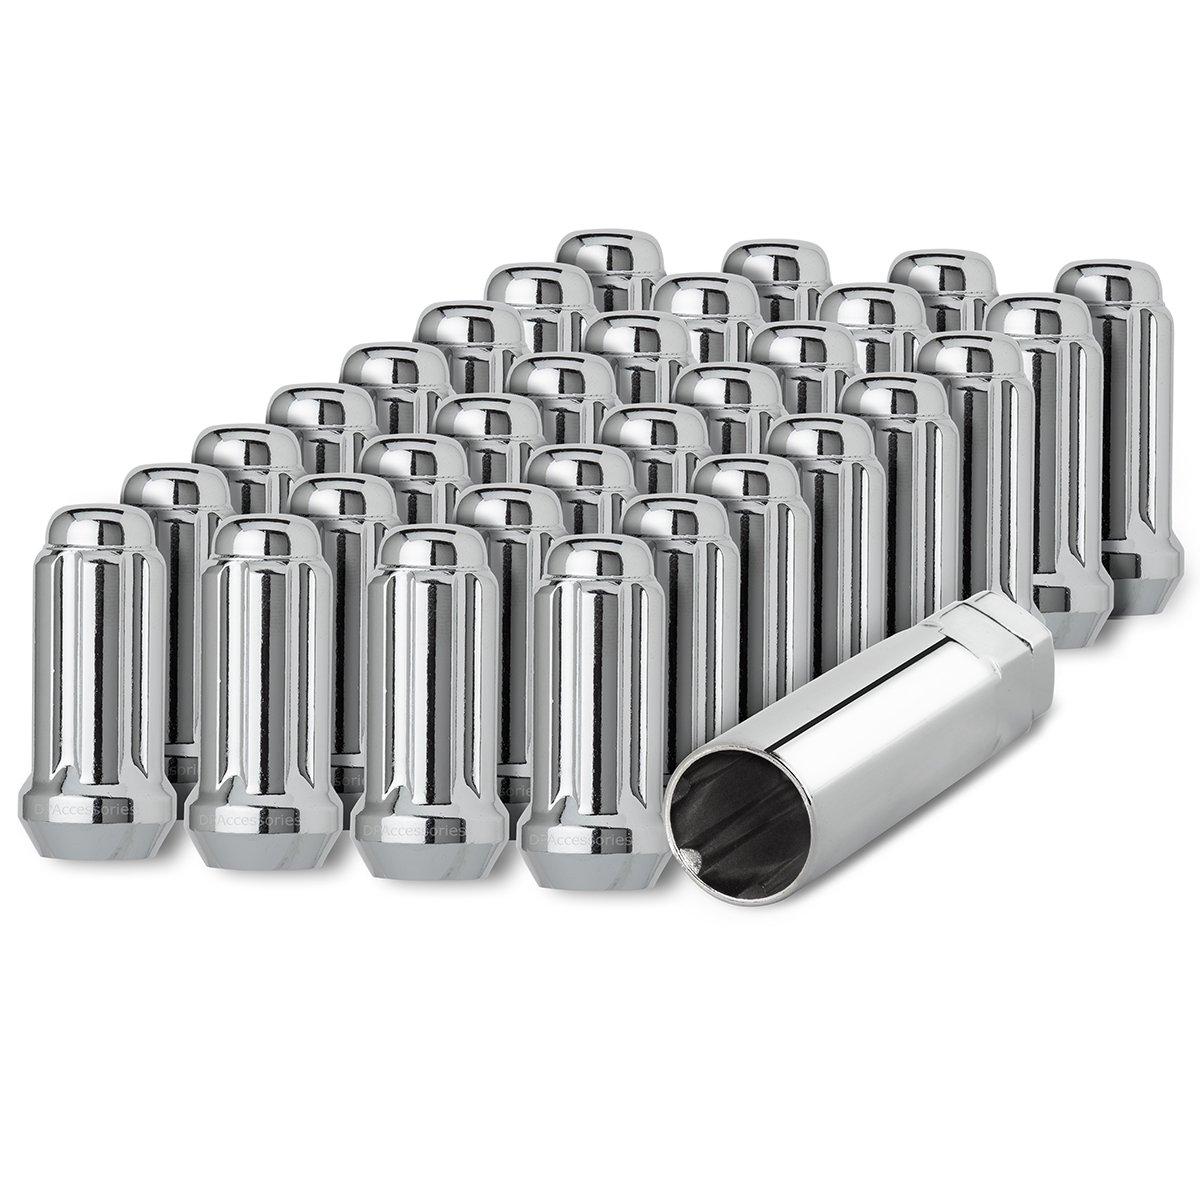 DPAccessories D5118-2305/32 32 Chrome 14x1.5 Closed End Duplex XL Spline Lug Nuts for Aftermarket Wheels Wheel Lug Nut